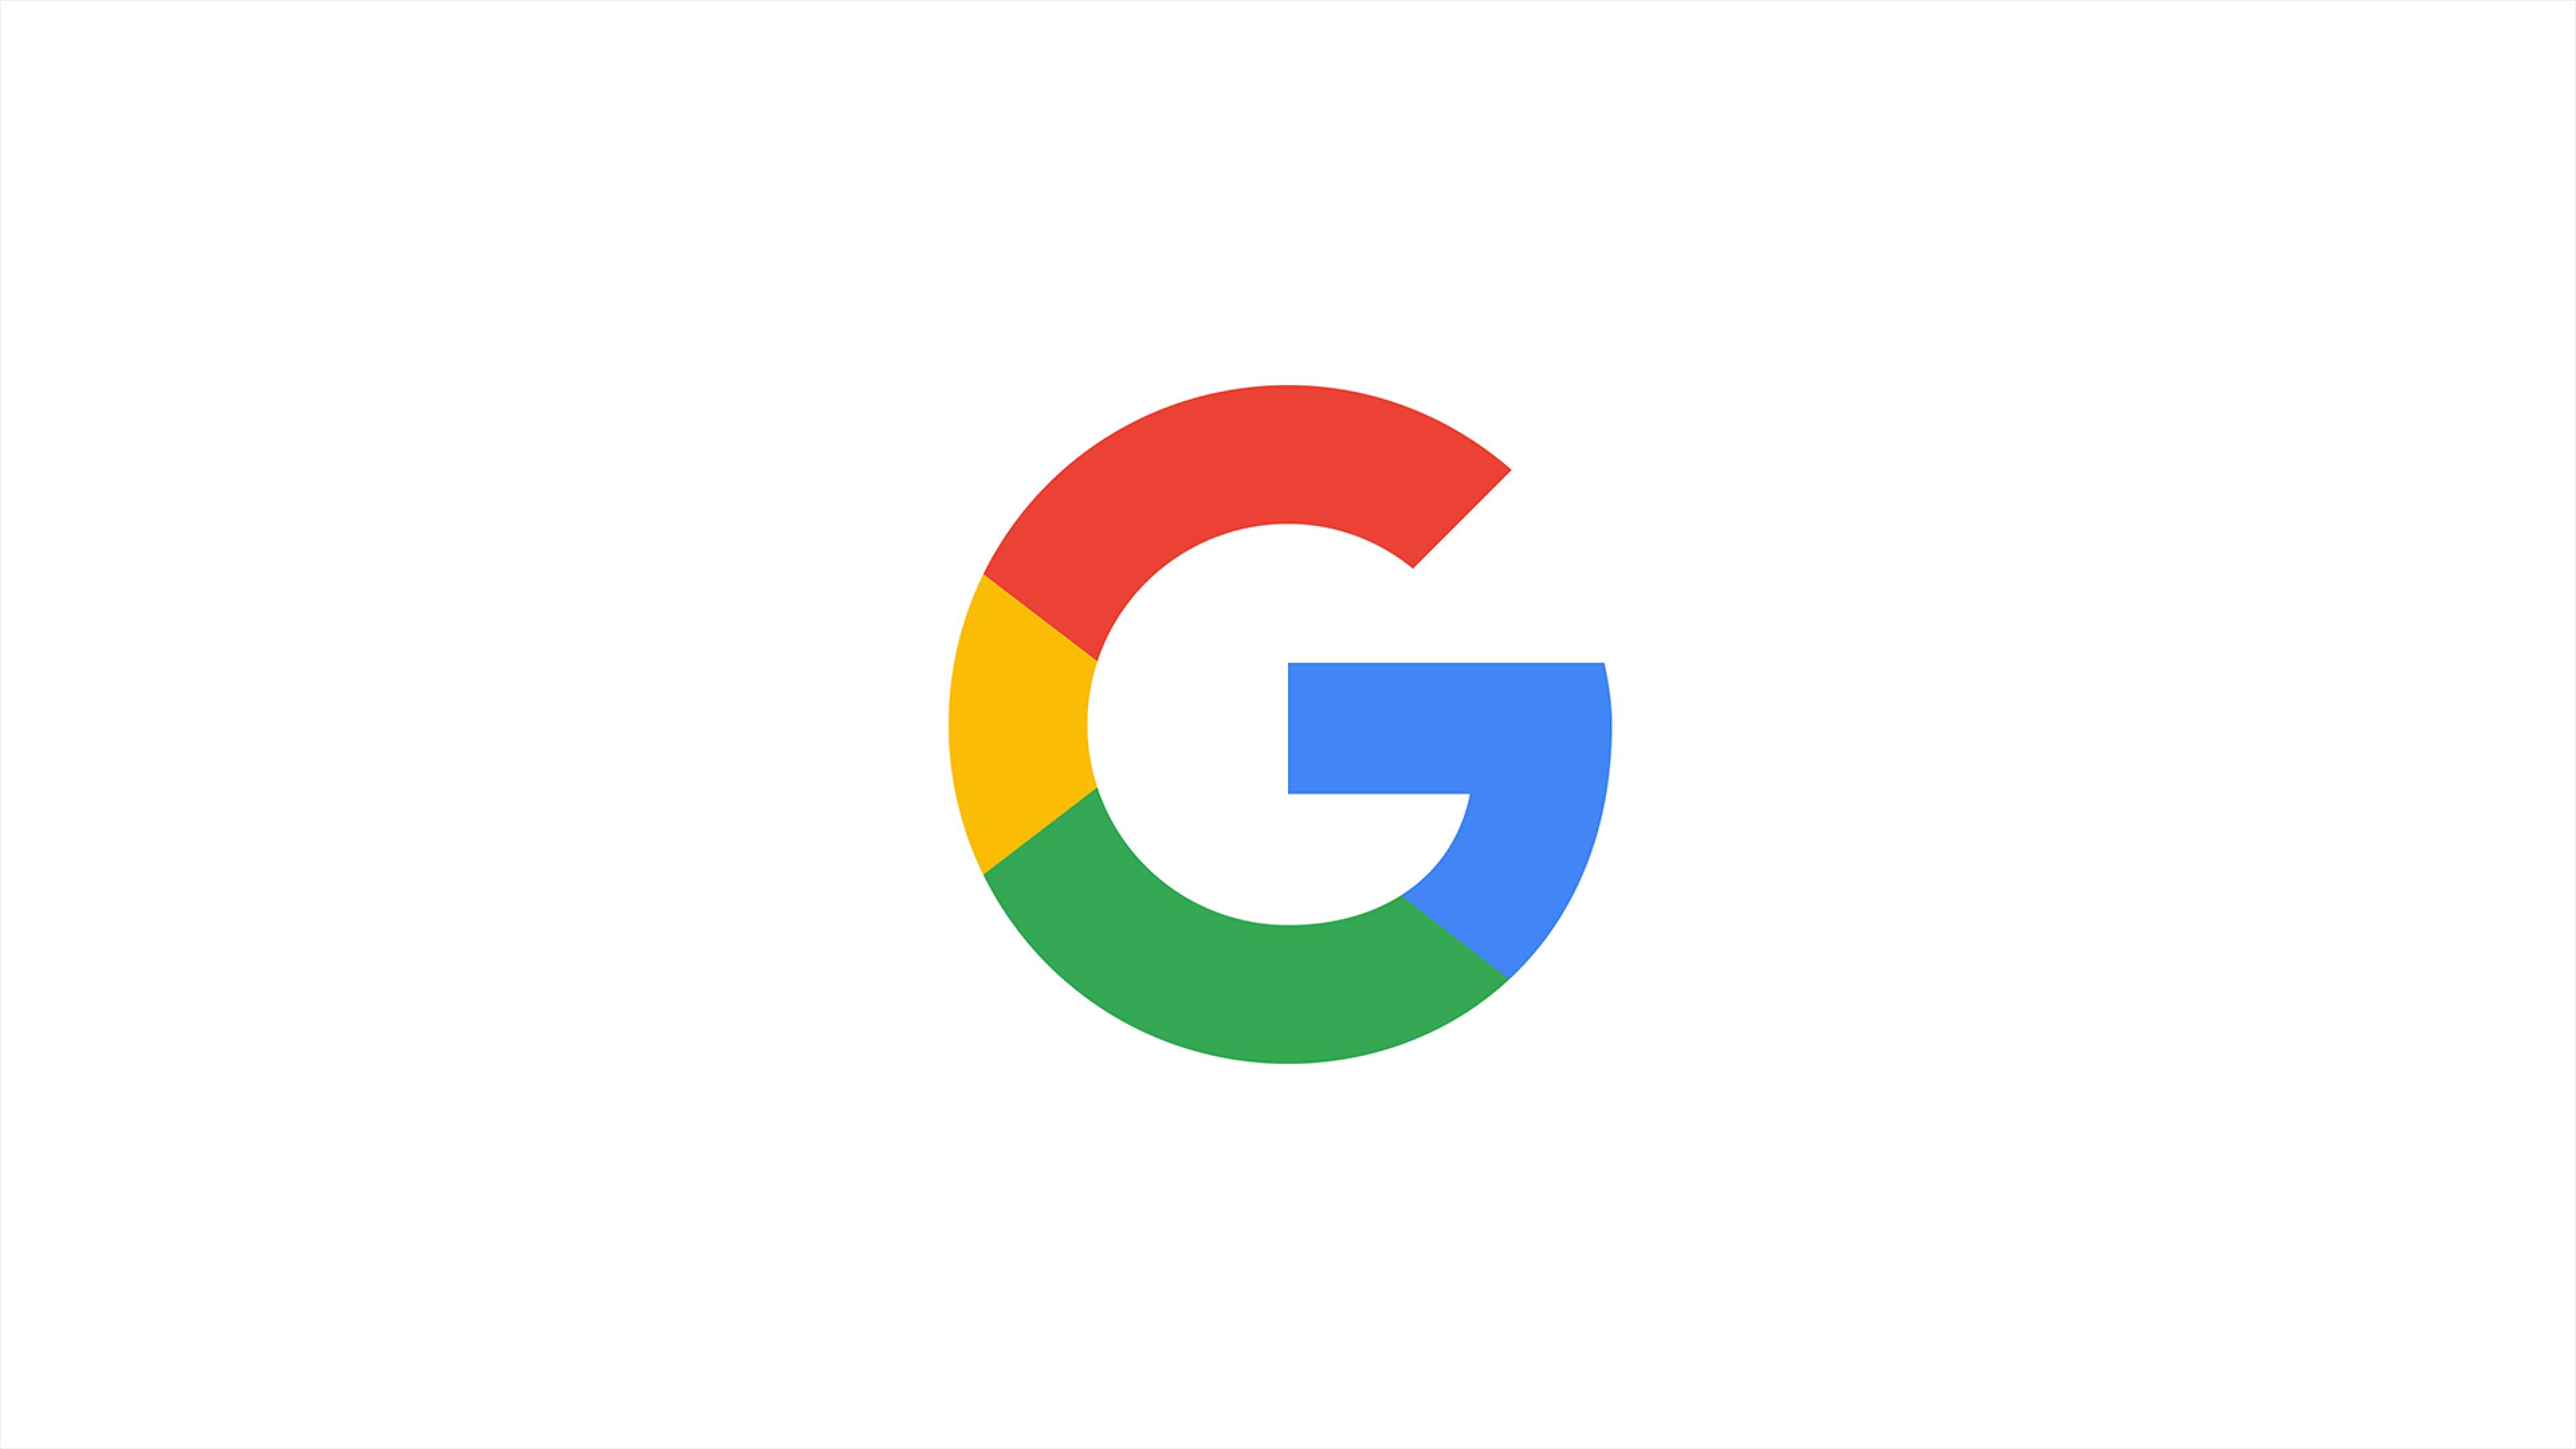 Google Creative Lab